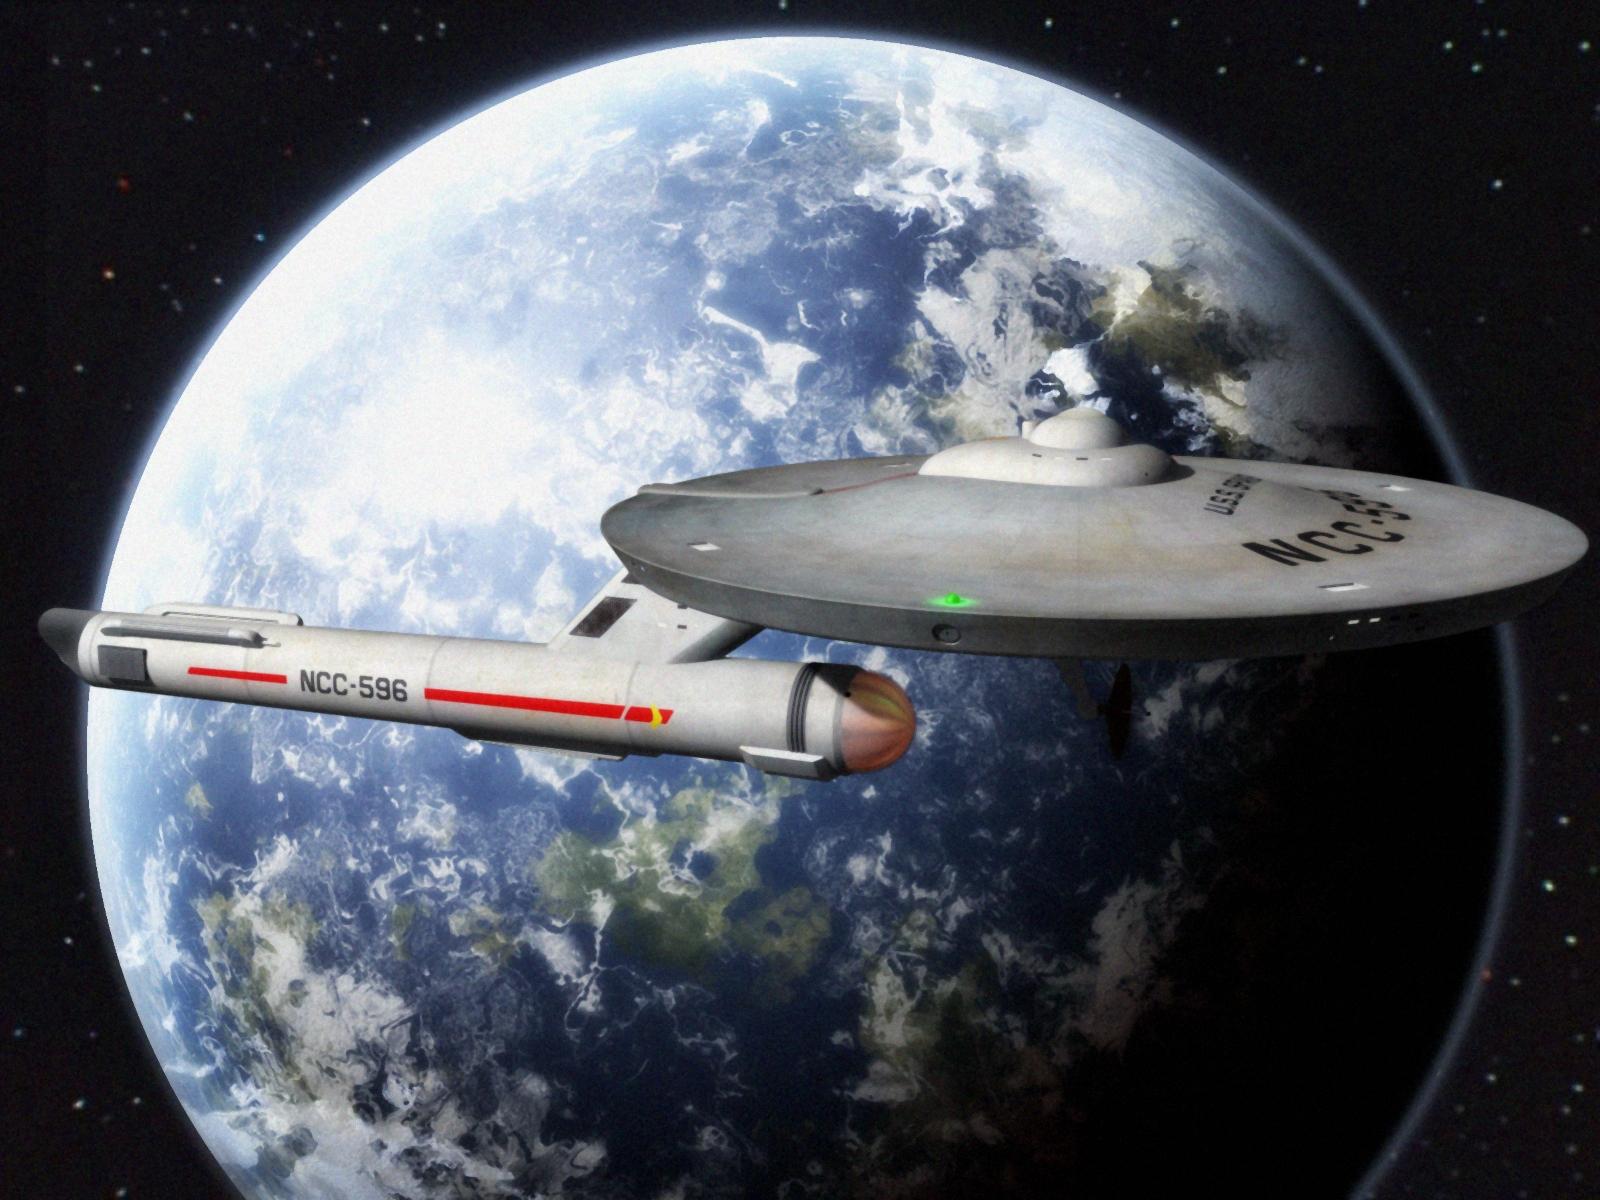 Hermes class USS Spaker by davemetlesits